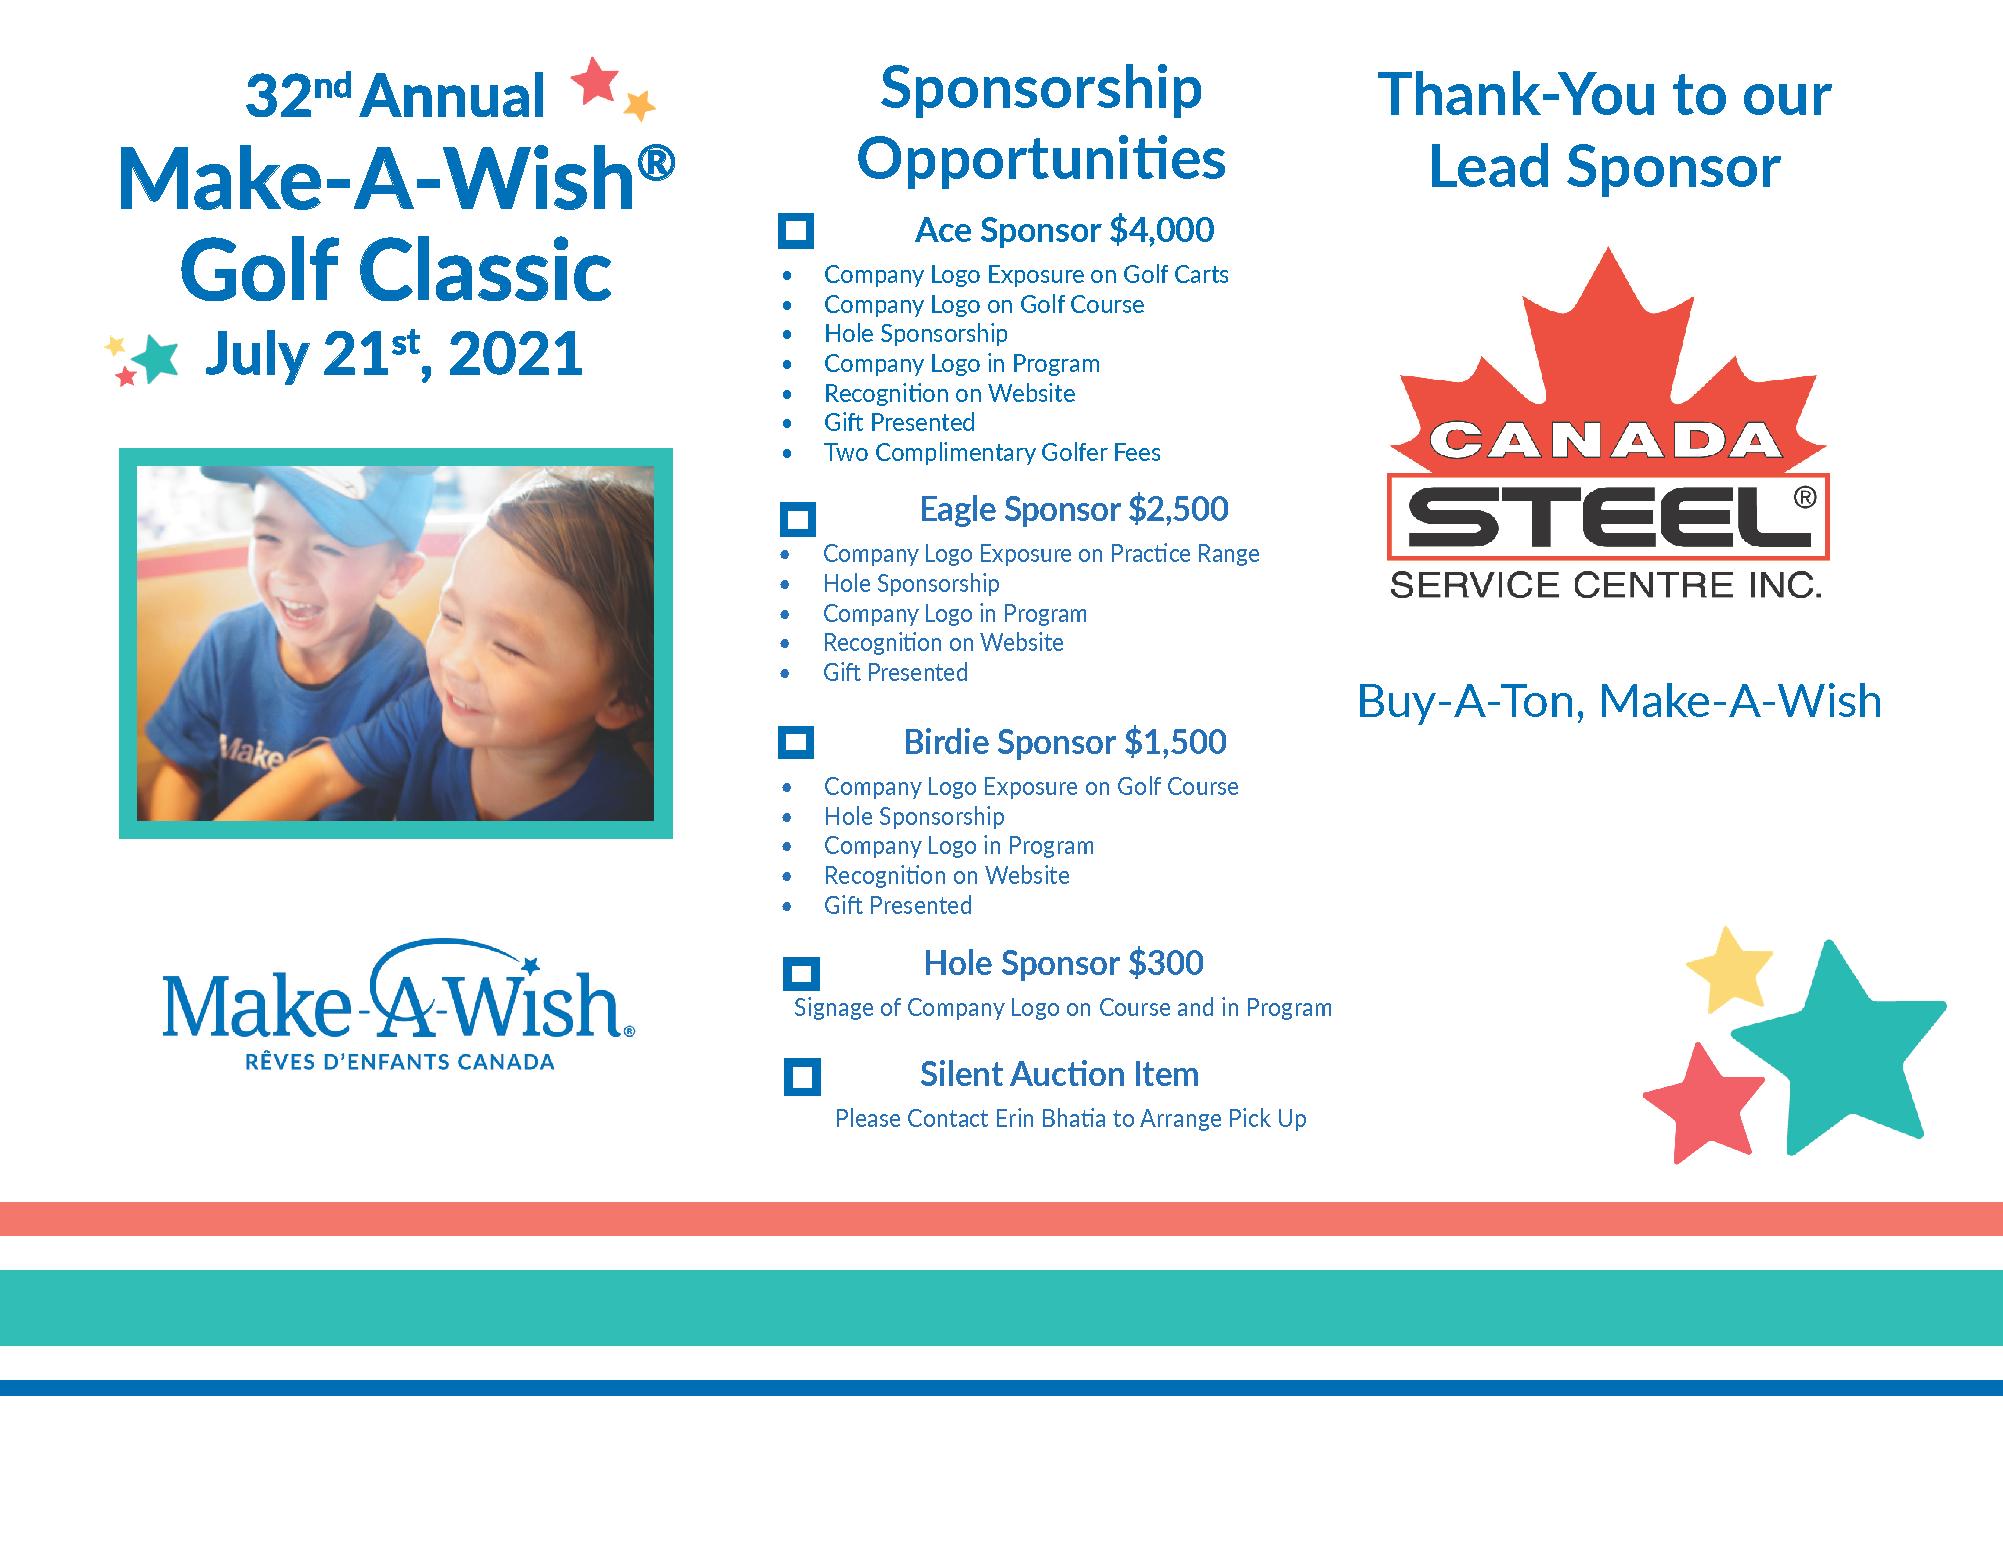 32nd Annual Make-A-Wish Golf Classic